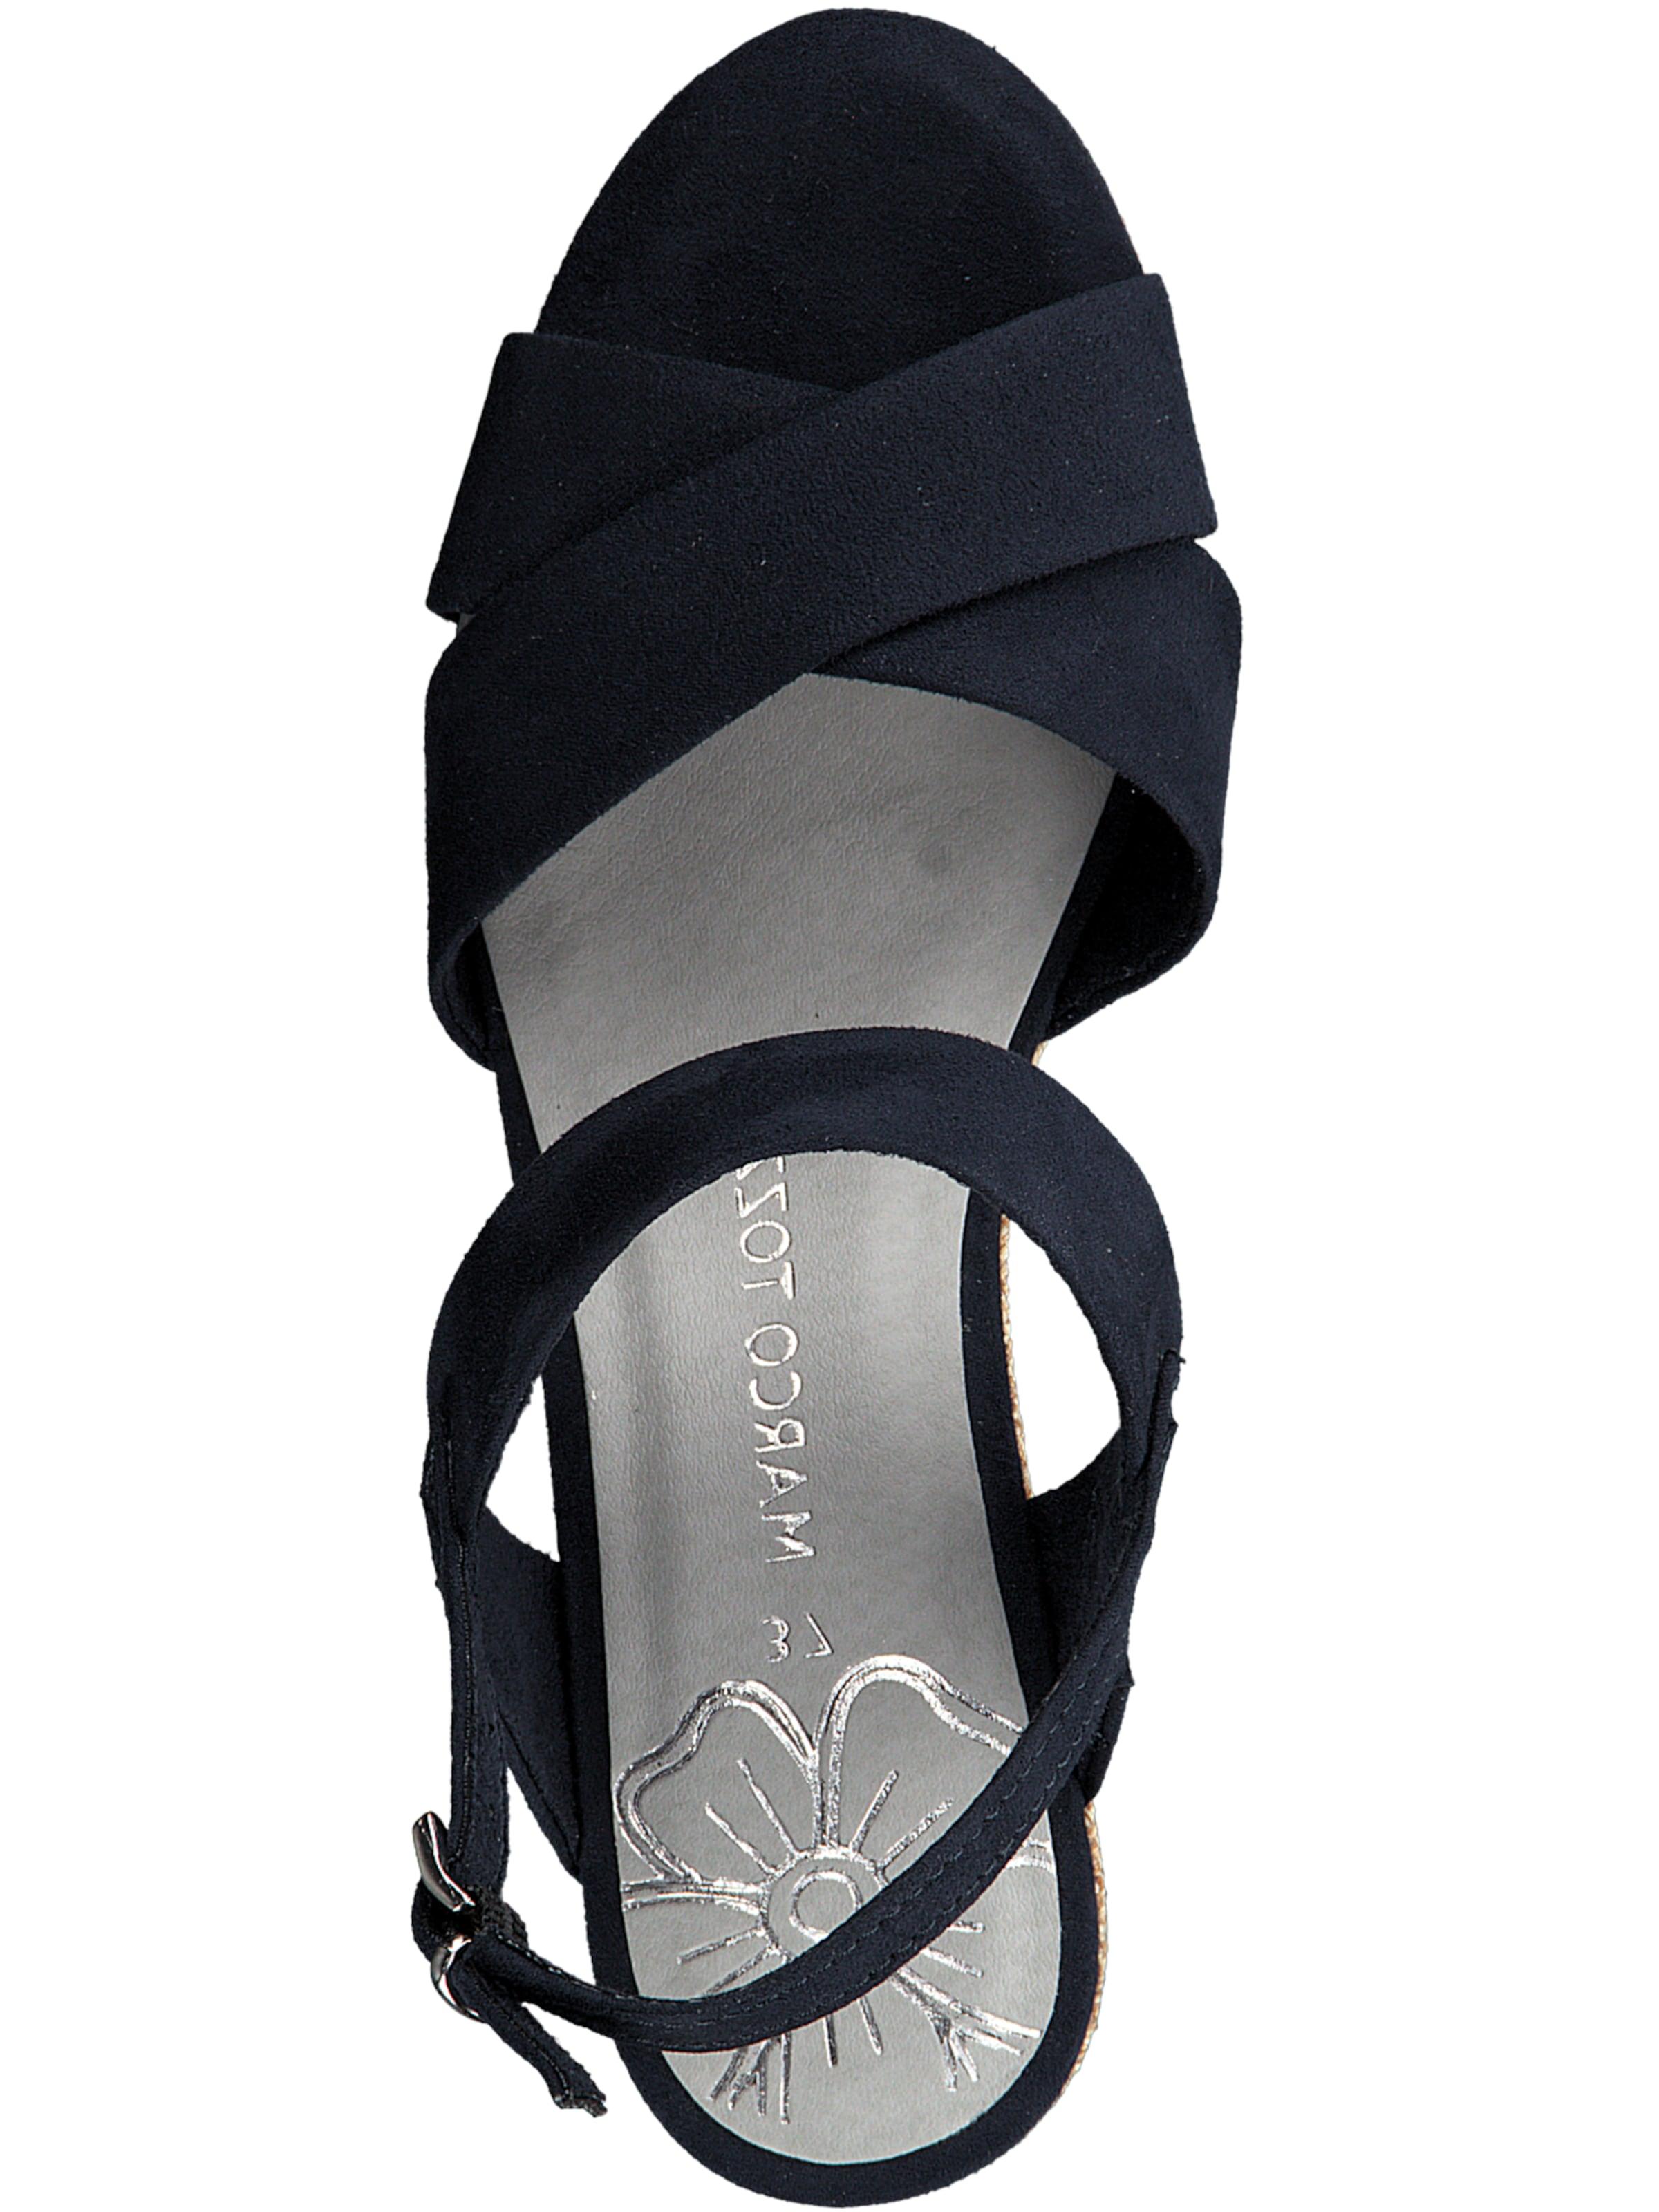 Sandales Bleu En Marine Marco Tozzi rdshQt